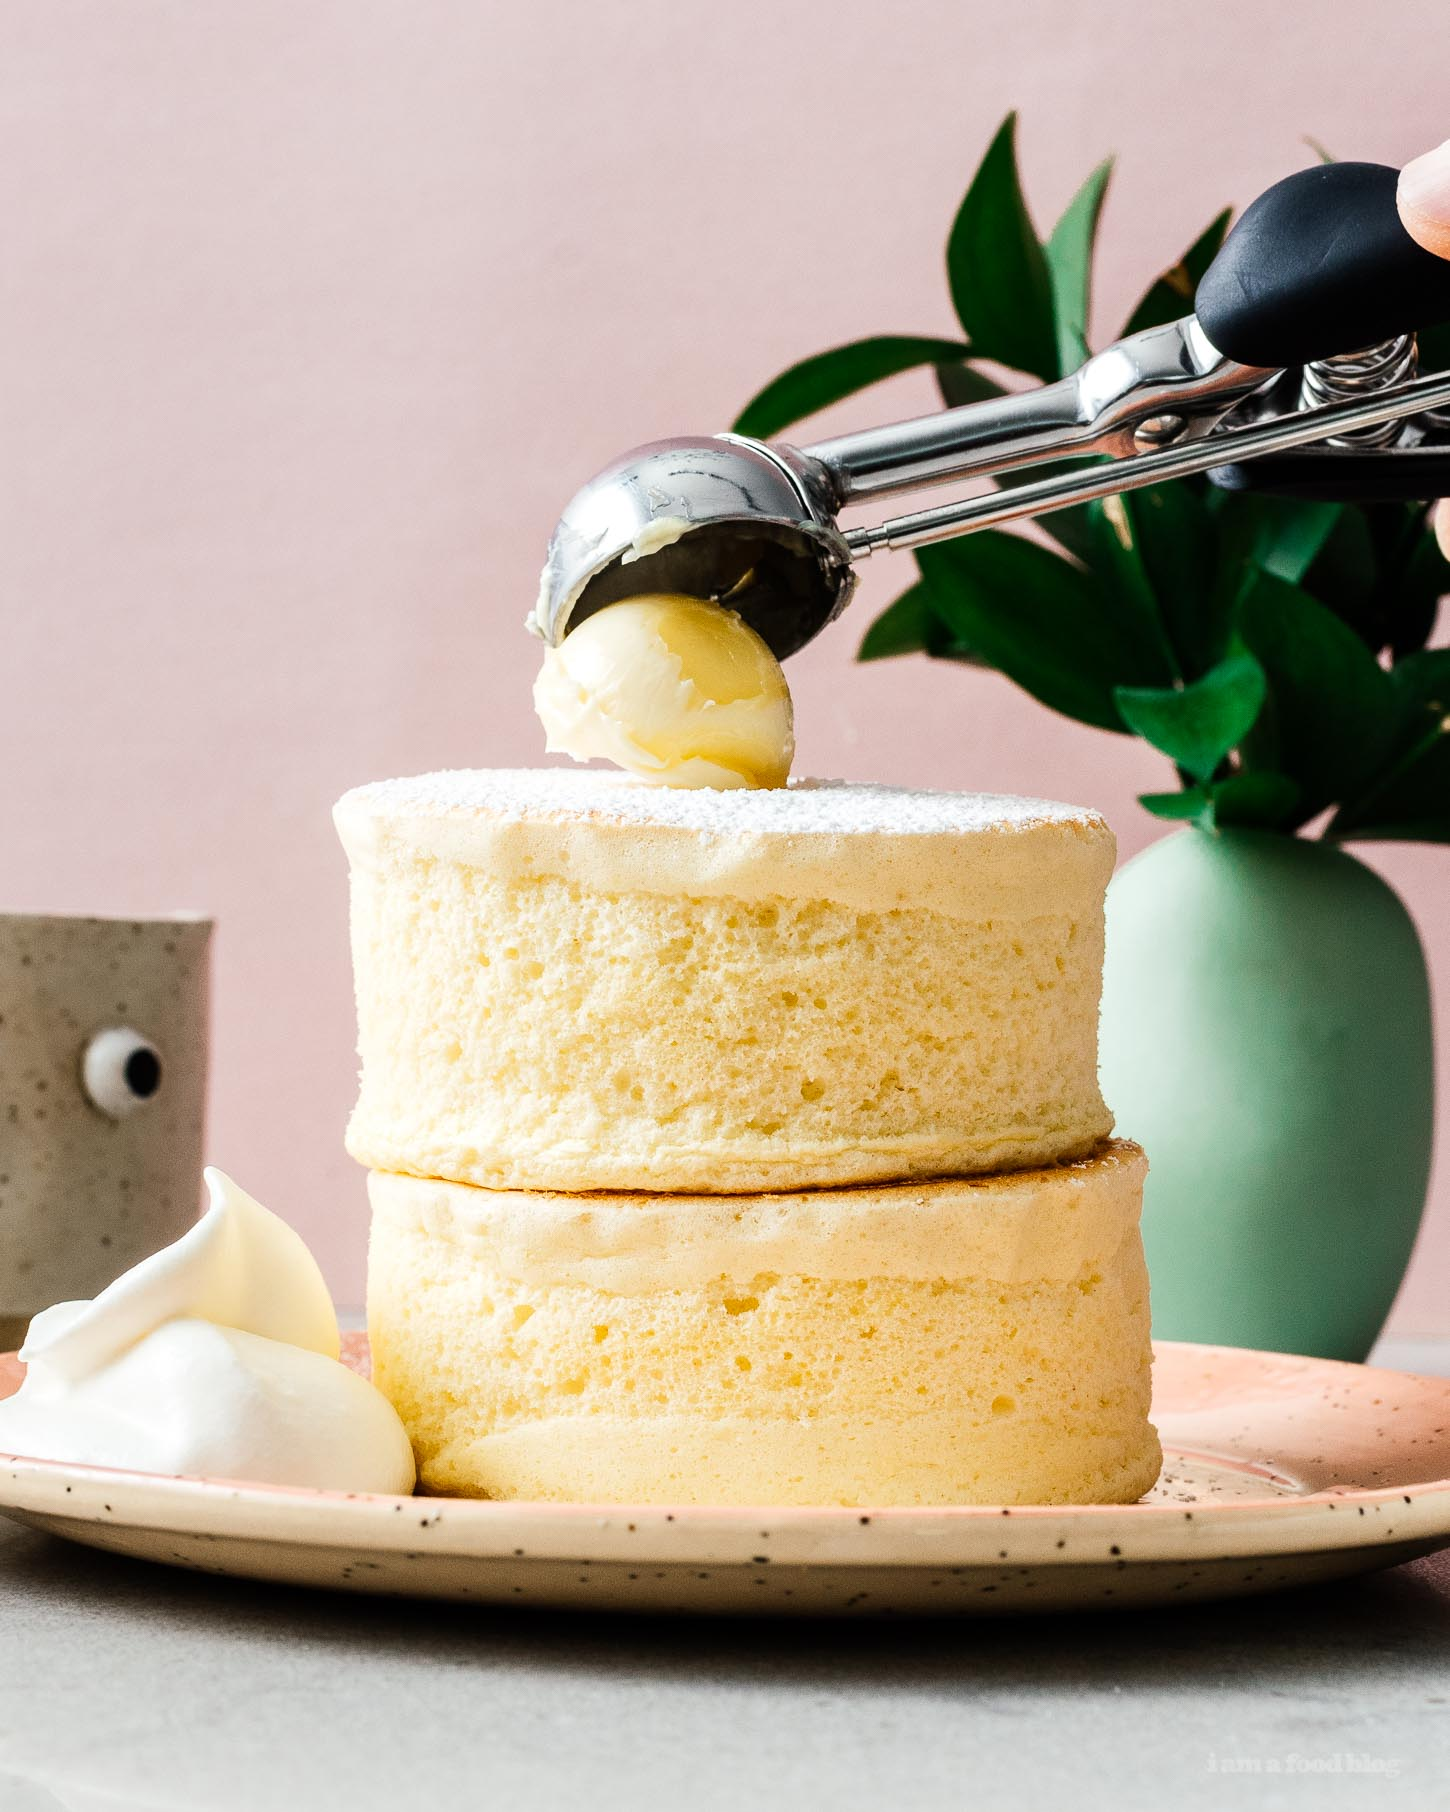 Skip the flight to Japan and make Gram Pancake extra tall fluffy Japanese soufflé pancakes right at home. #soufflepancake #pancakes #japanese #recipe #grampancakes